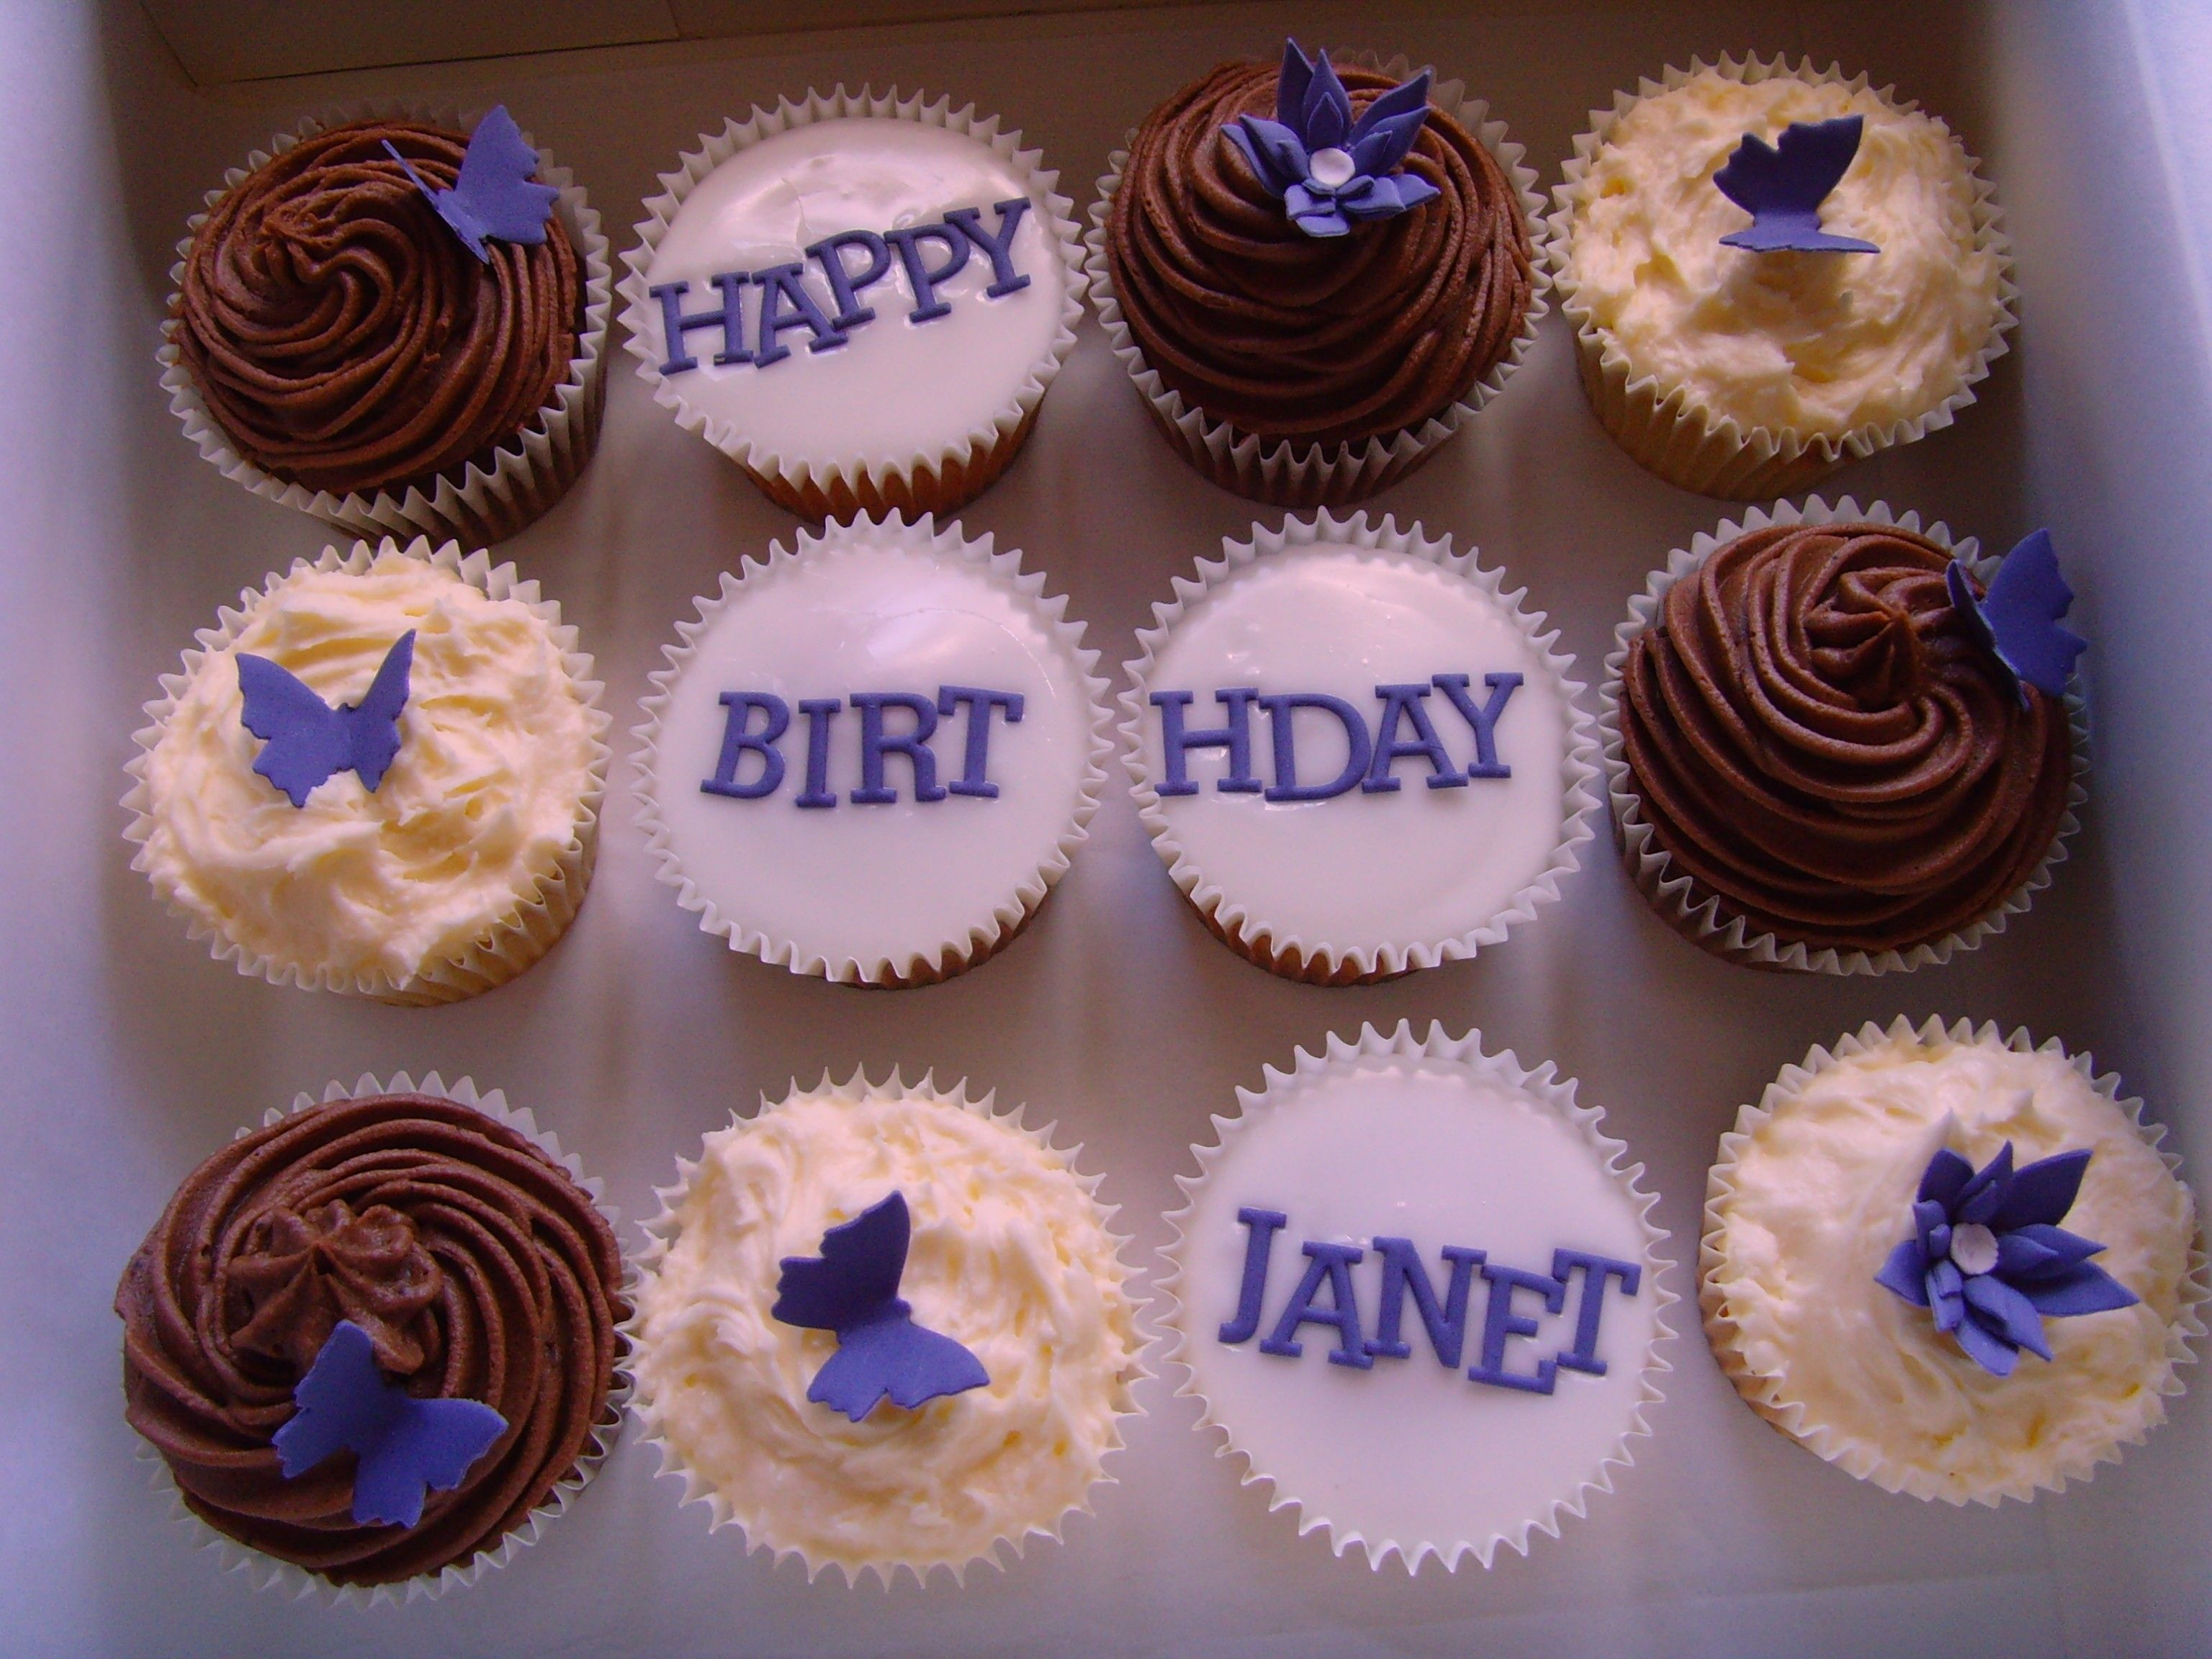 Happy Birthday Janet Cake Atletischsport